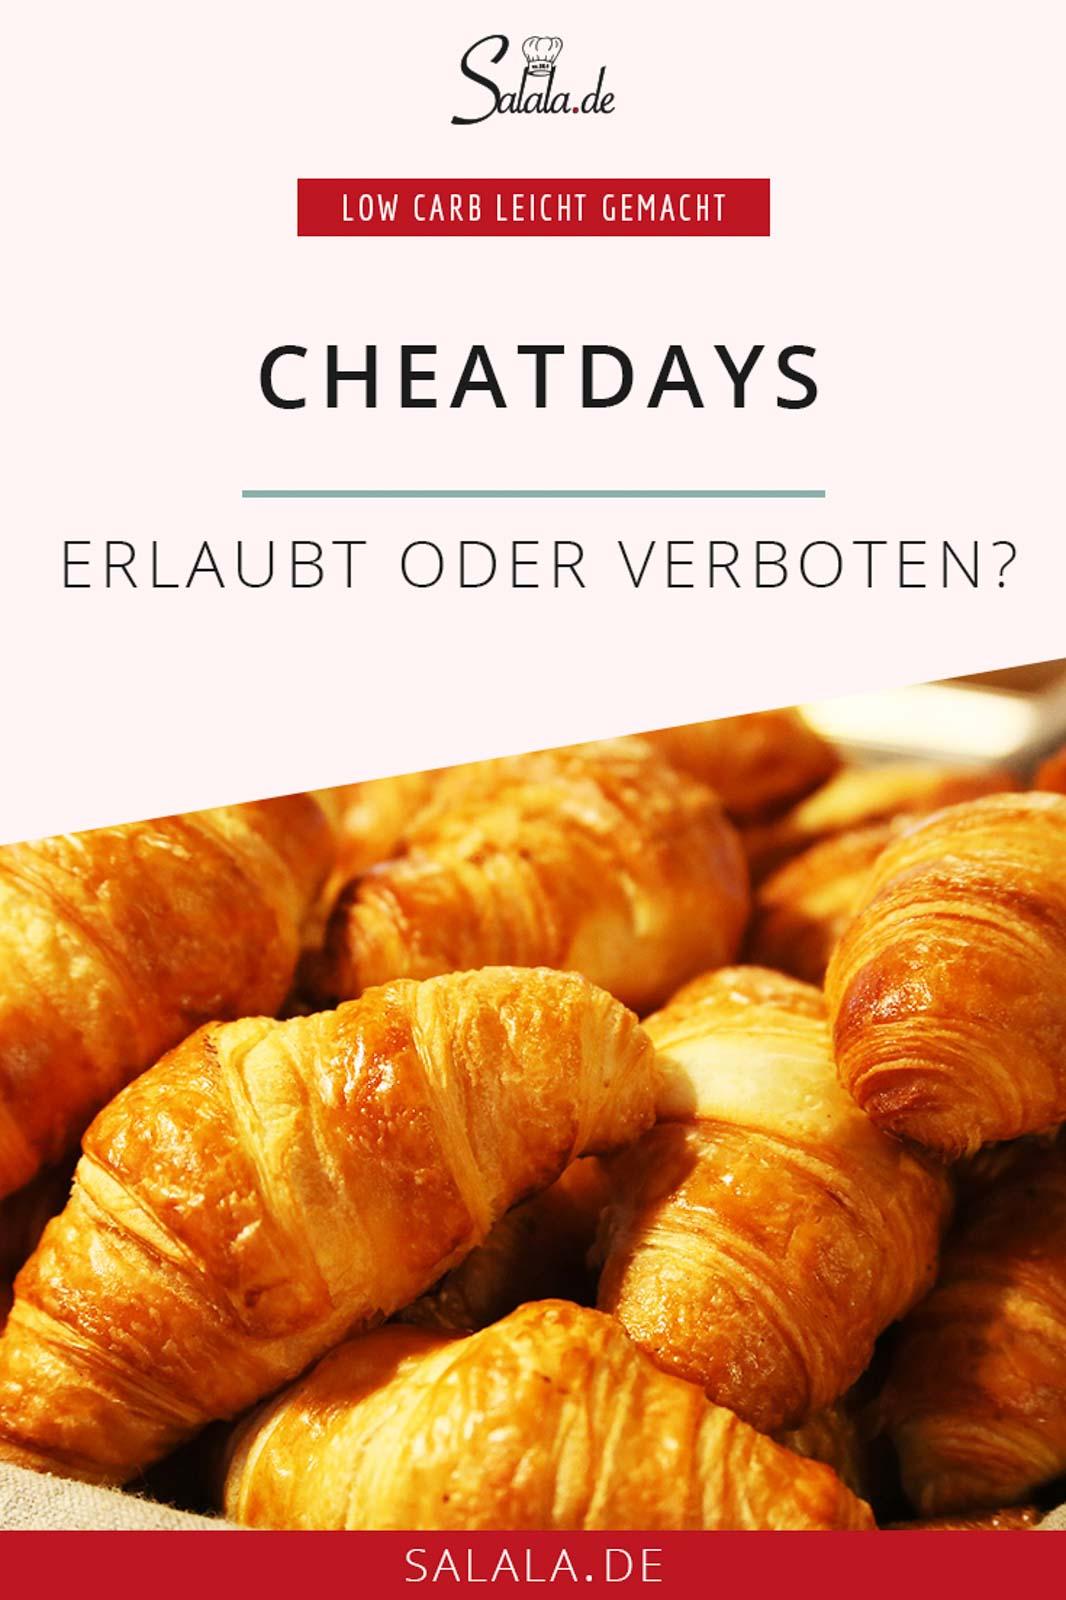 #cheatdays #lowcarb #lowcarbwissen #ausnahmenbeilowcarb